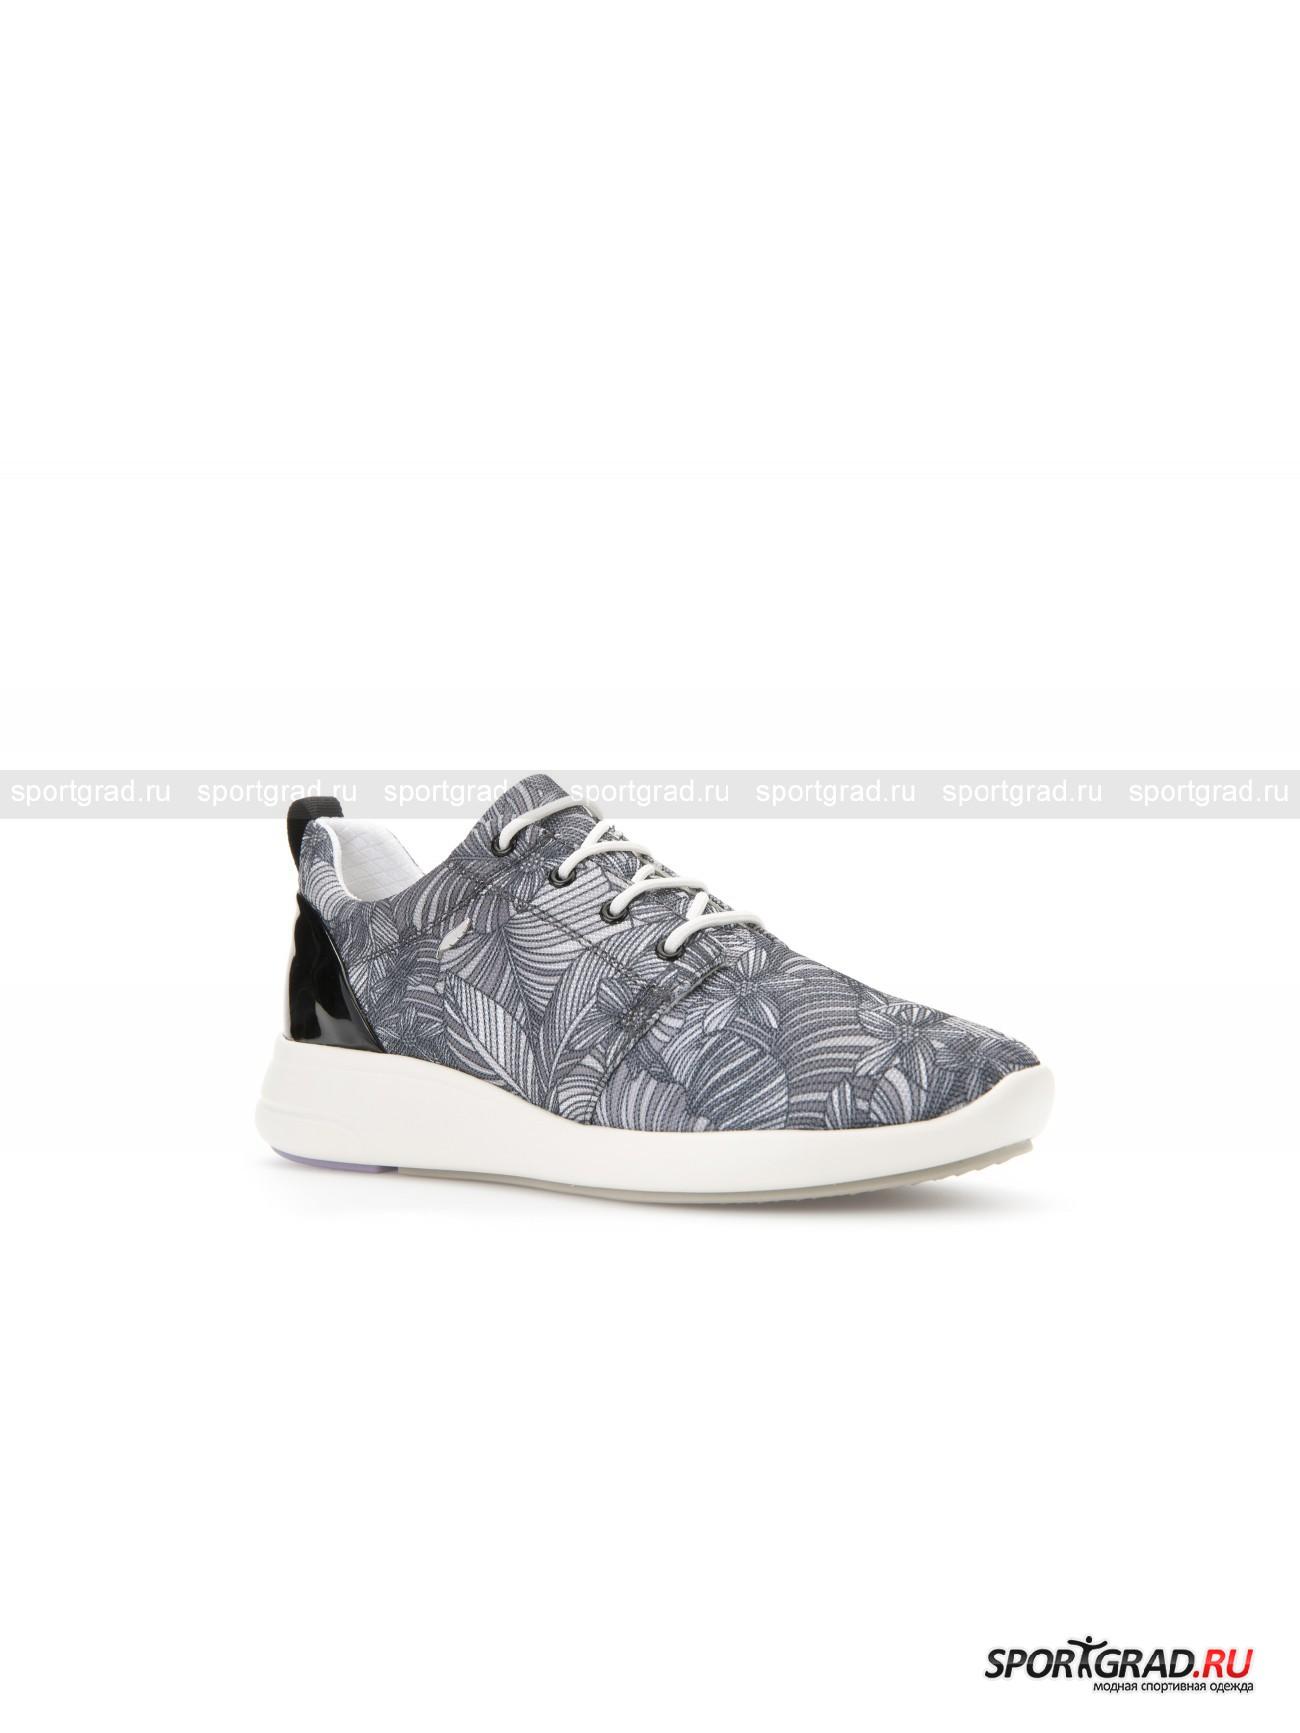 Geox Schuhe OPHIRA grau Damenschuhe D621CA 0AN02 C0060